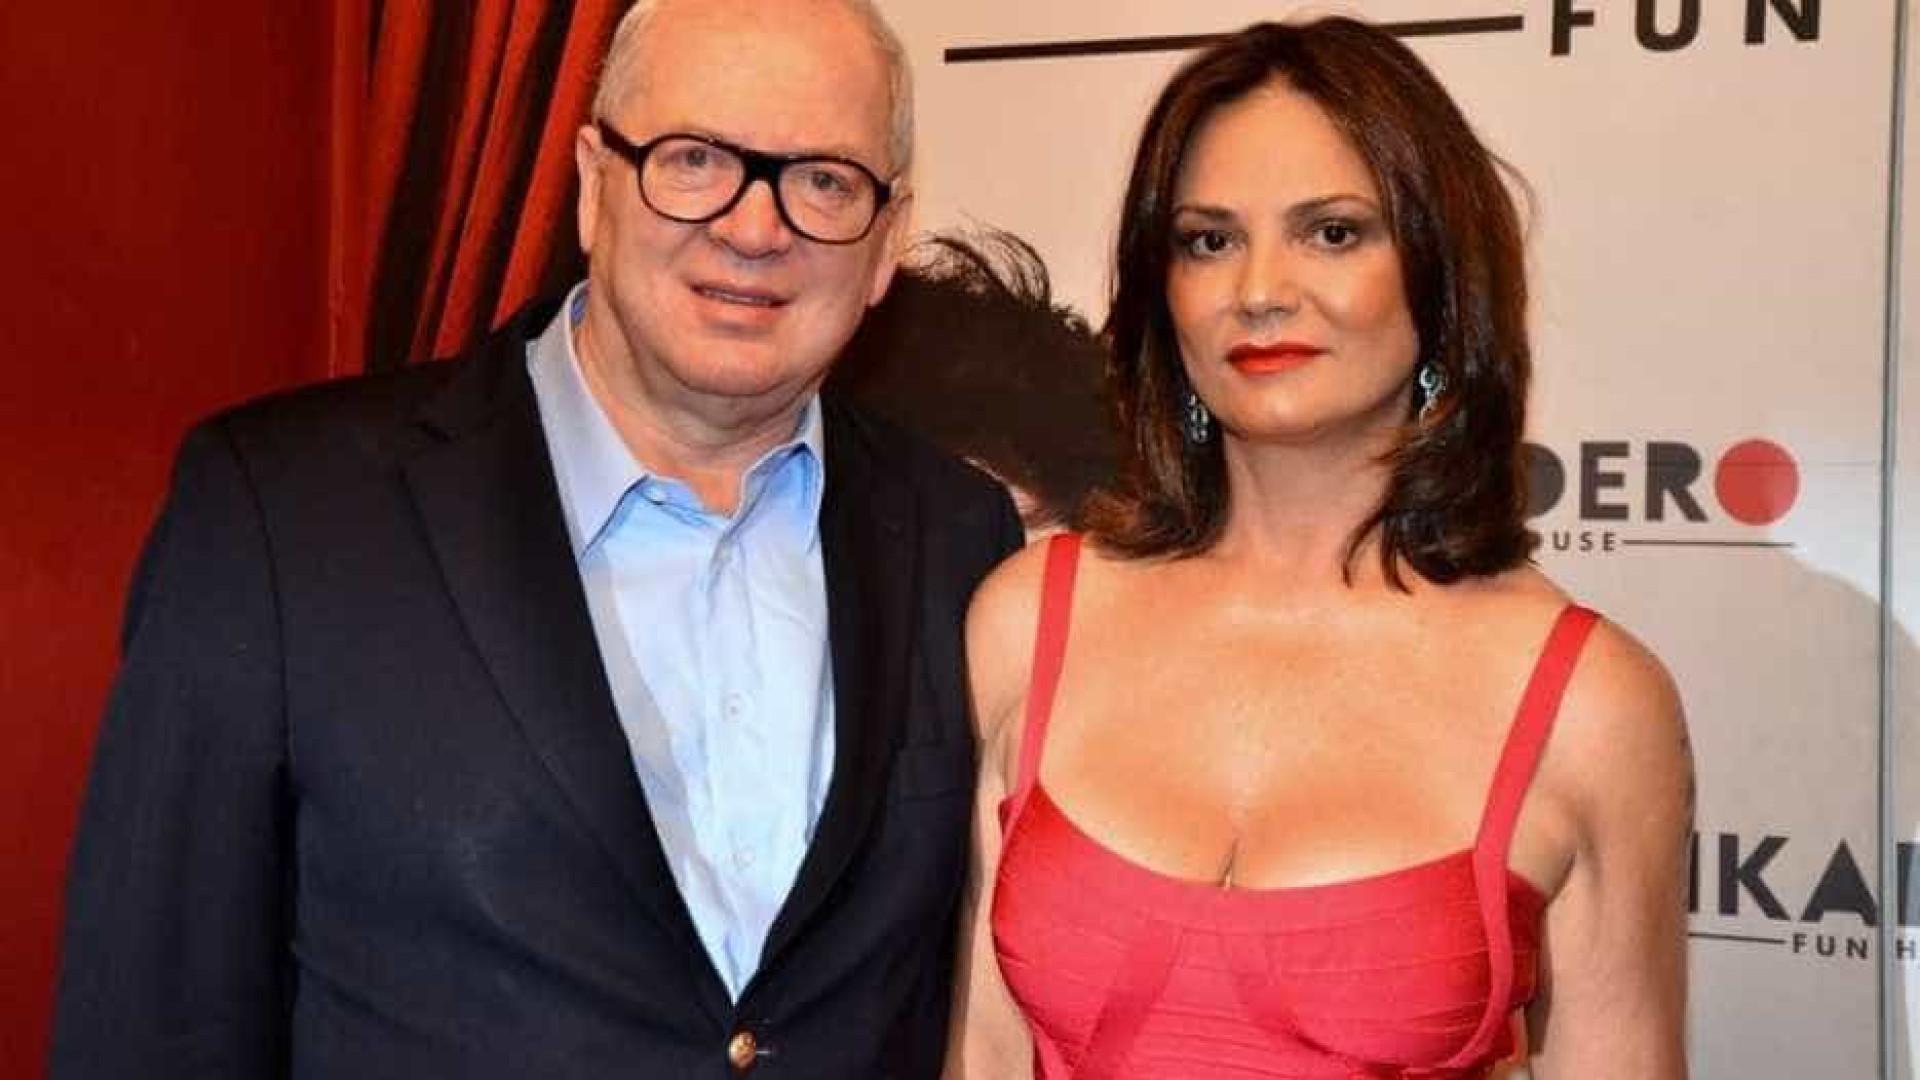 STJ nega pedido de habeas corpus de Lírio Parisotto